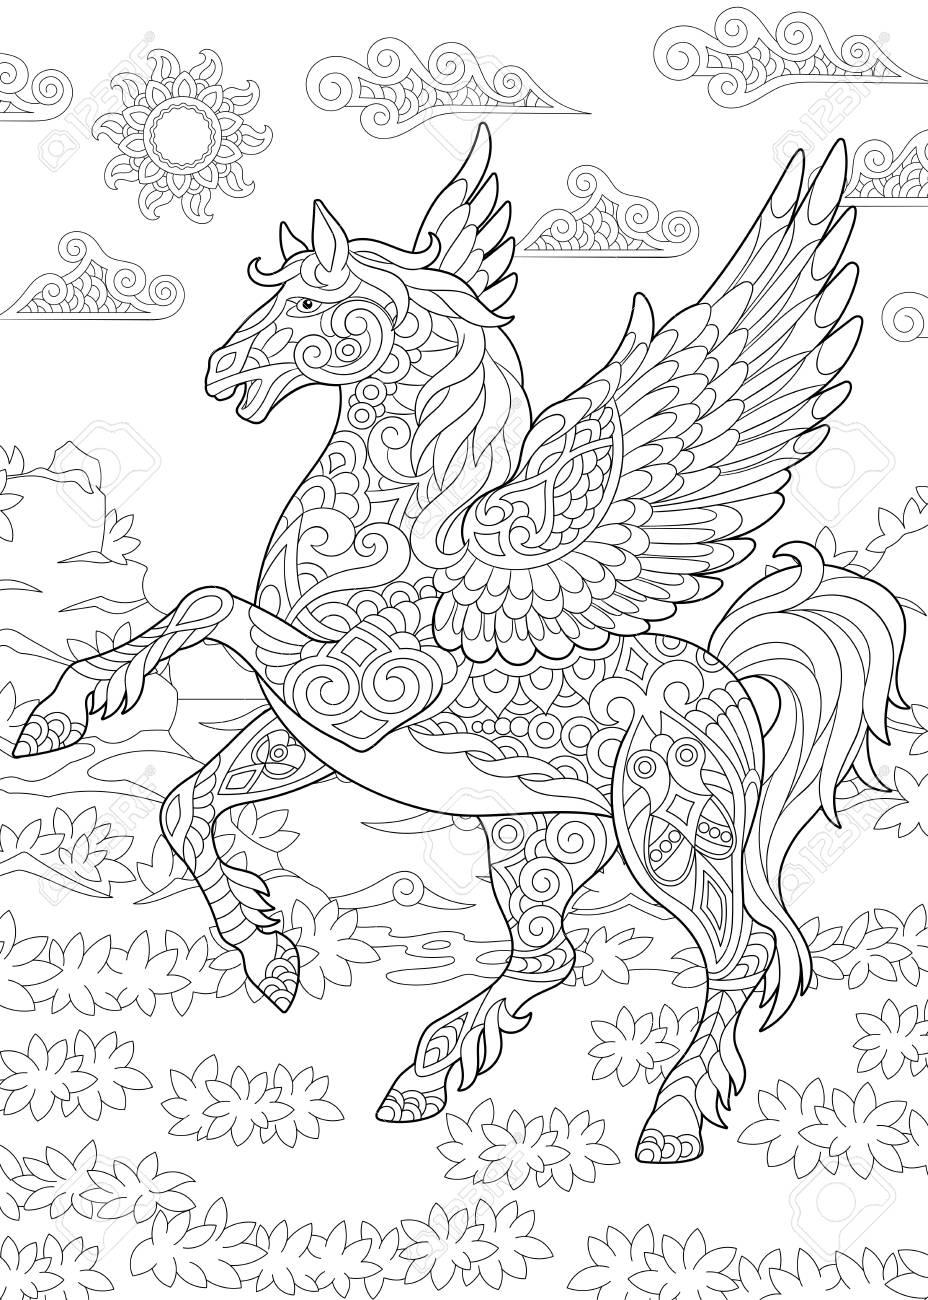 pegasus coloring page.html